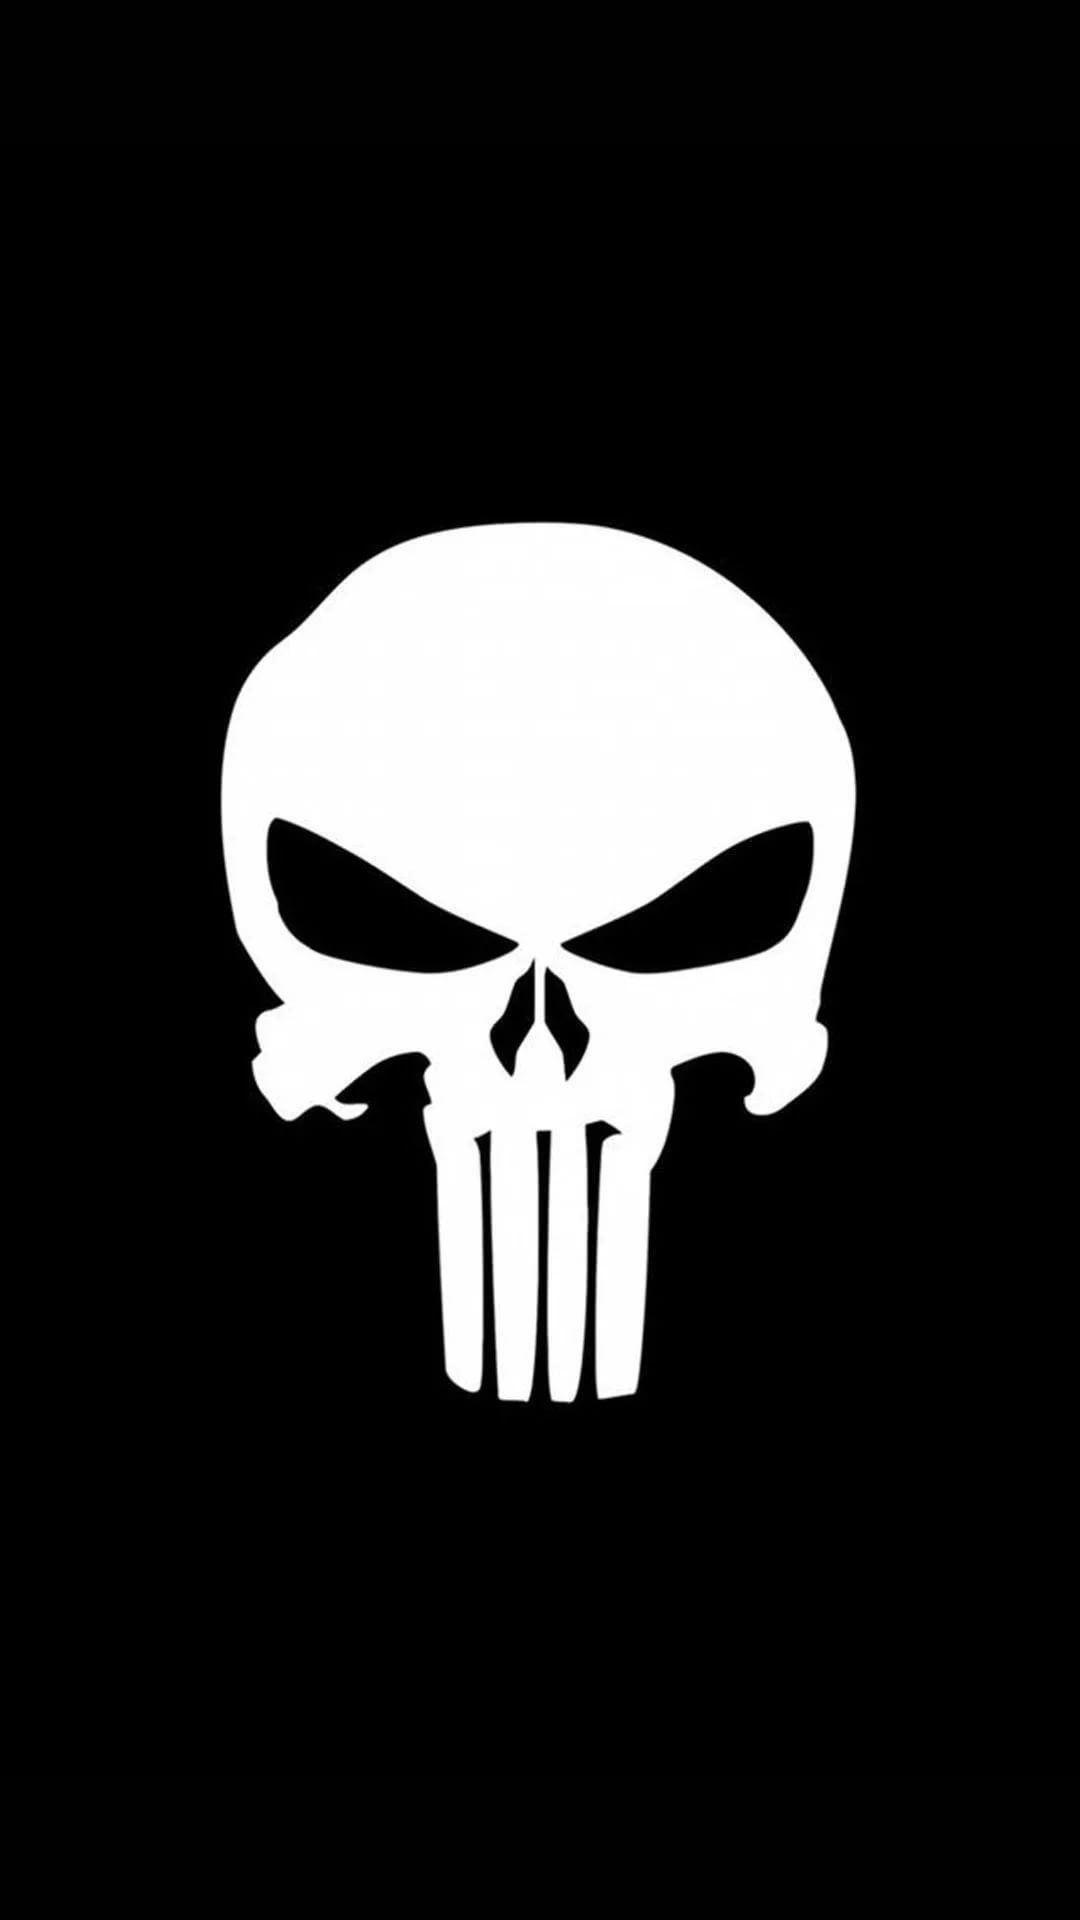 Cool Skull iPhone se wallpaper